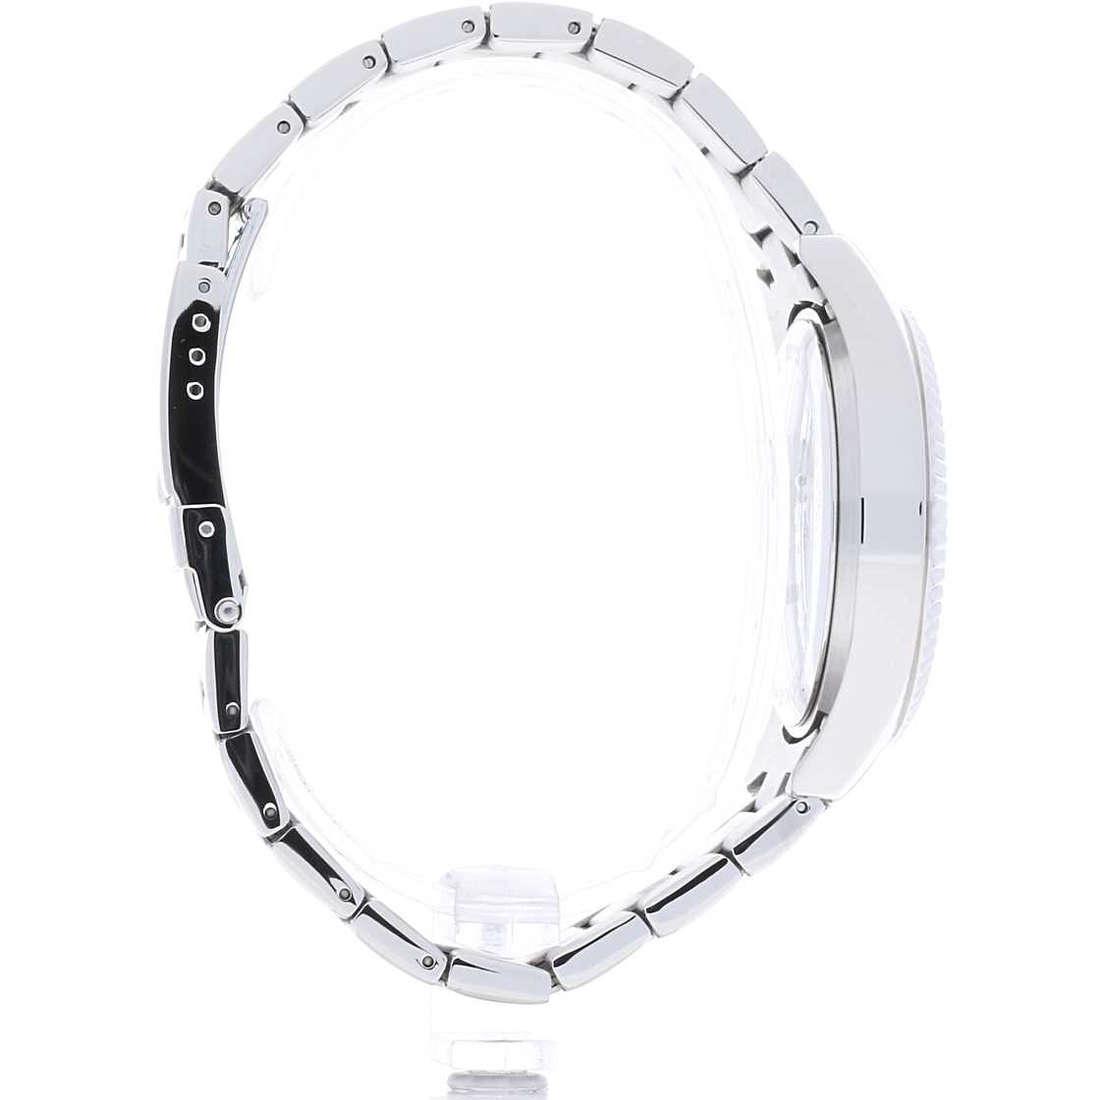 acquista orologi uomo Sector R3273676003